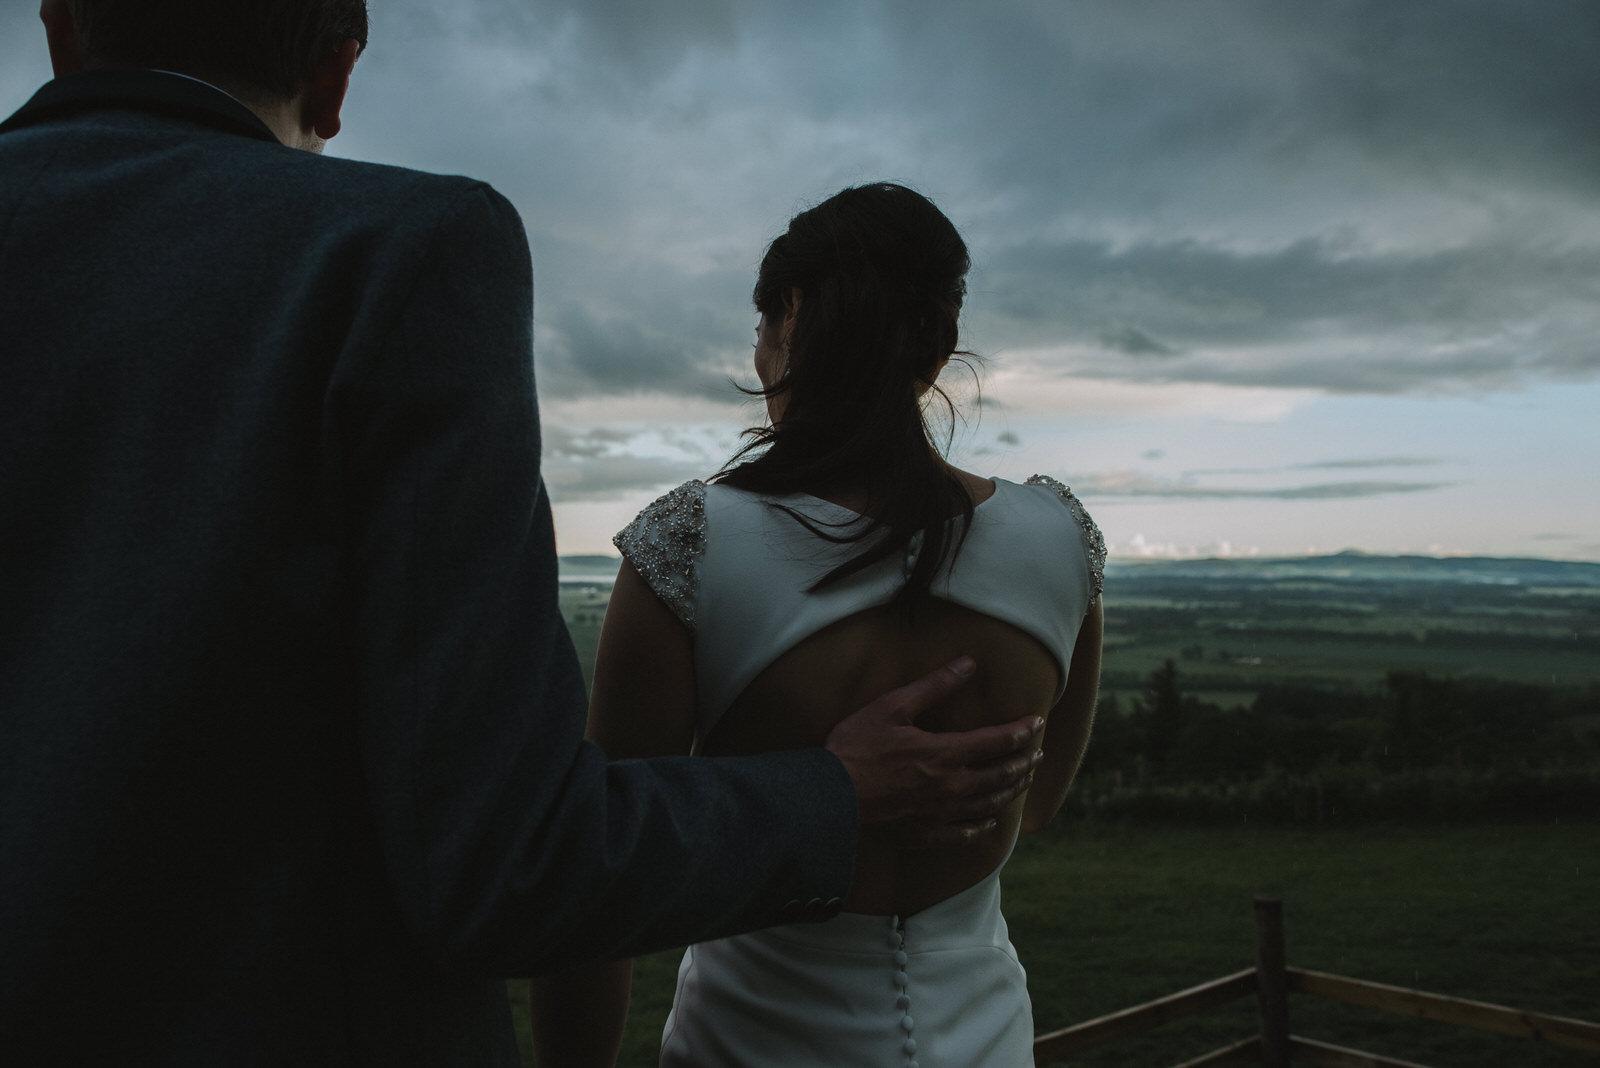 059-GUARDSWELL-FARM-WEDDING-ALTERNATIVE-SCOTTISH-WEDDING-PHOTOGRAPHER-SCOTTISH-WEDDING-DESTINATION-WEDDING-PHOTOGRAPHER.JPG